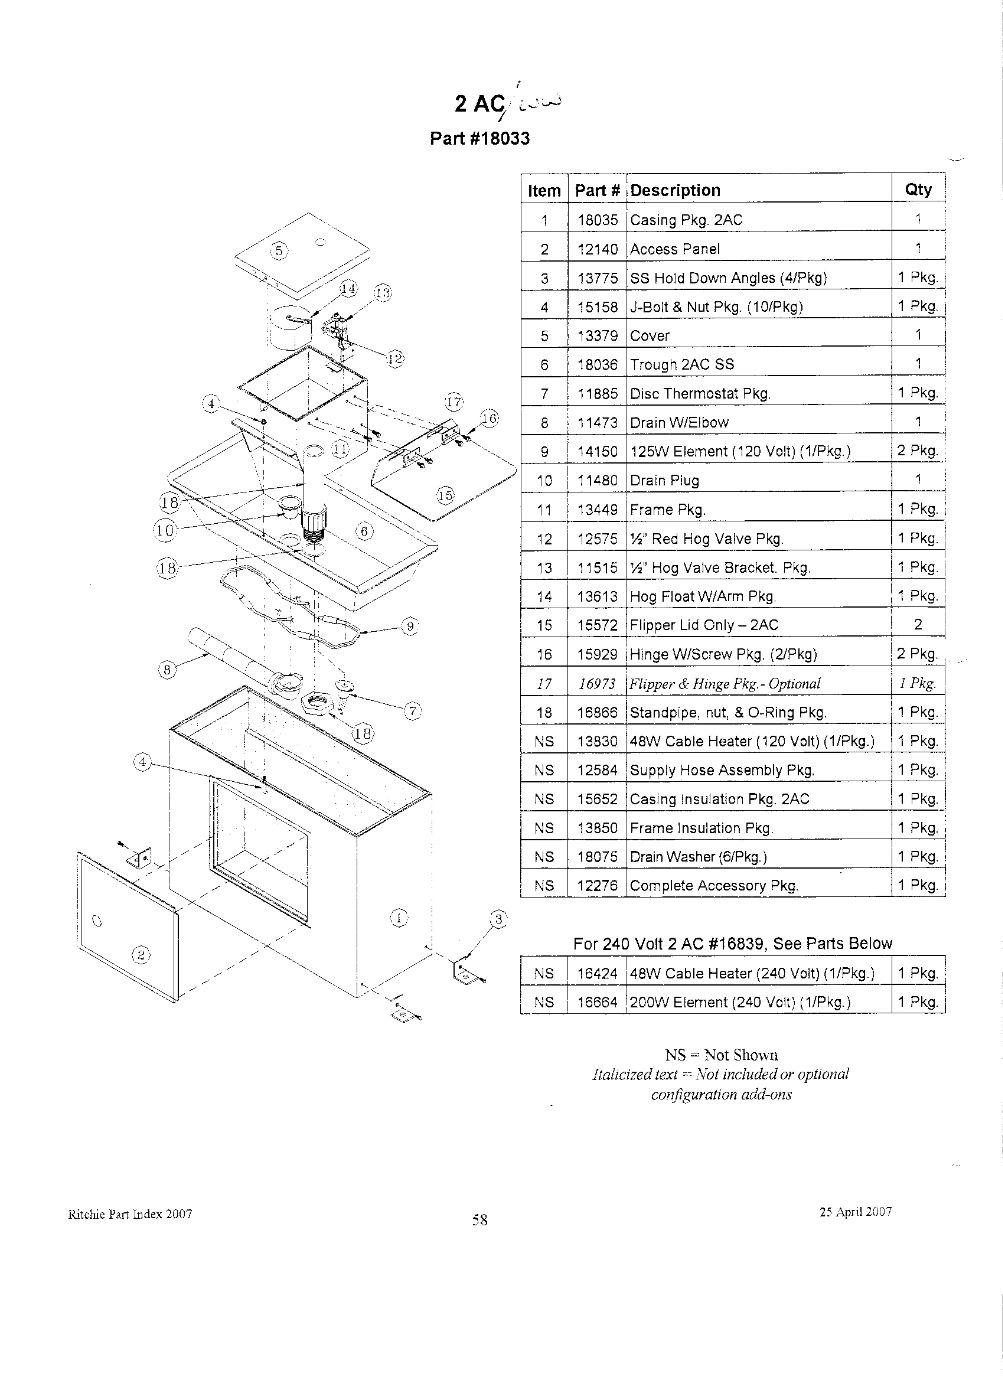 Ritchie Waterer Wiring Diagram 2ac. . Wiring Diagram